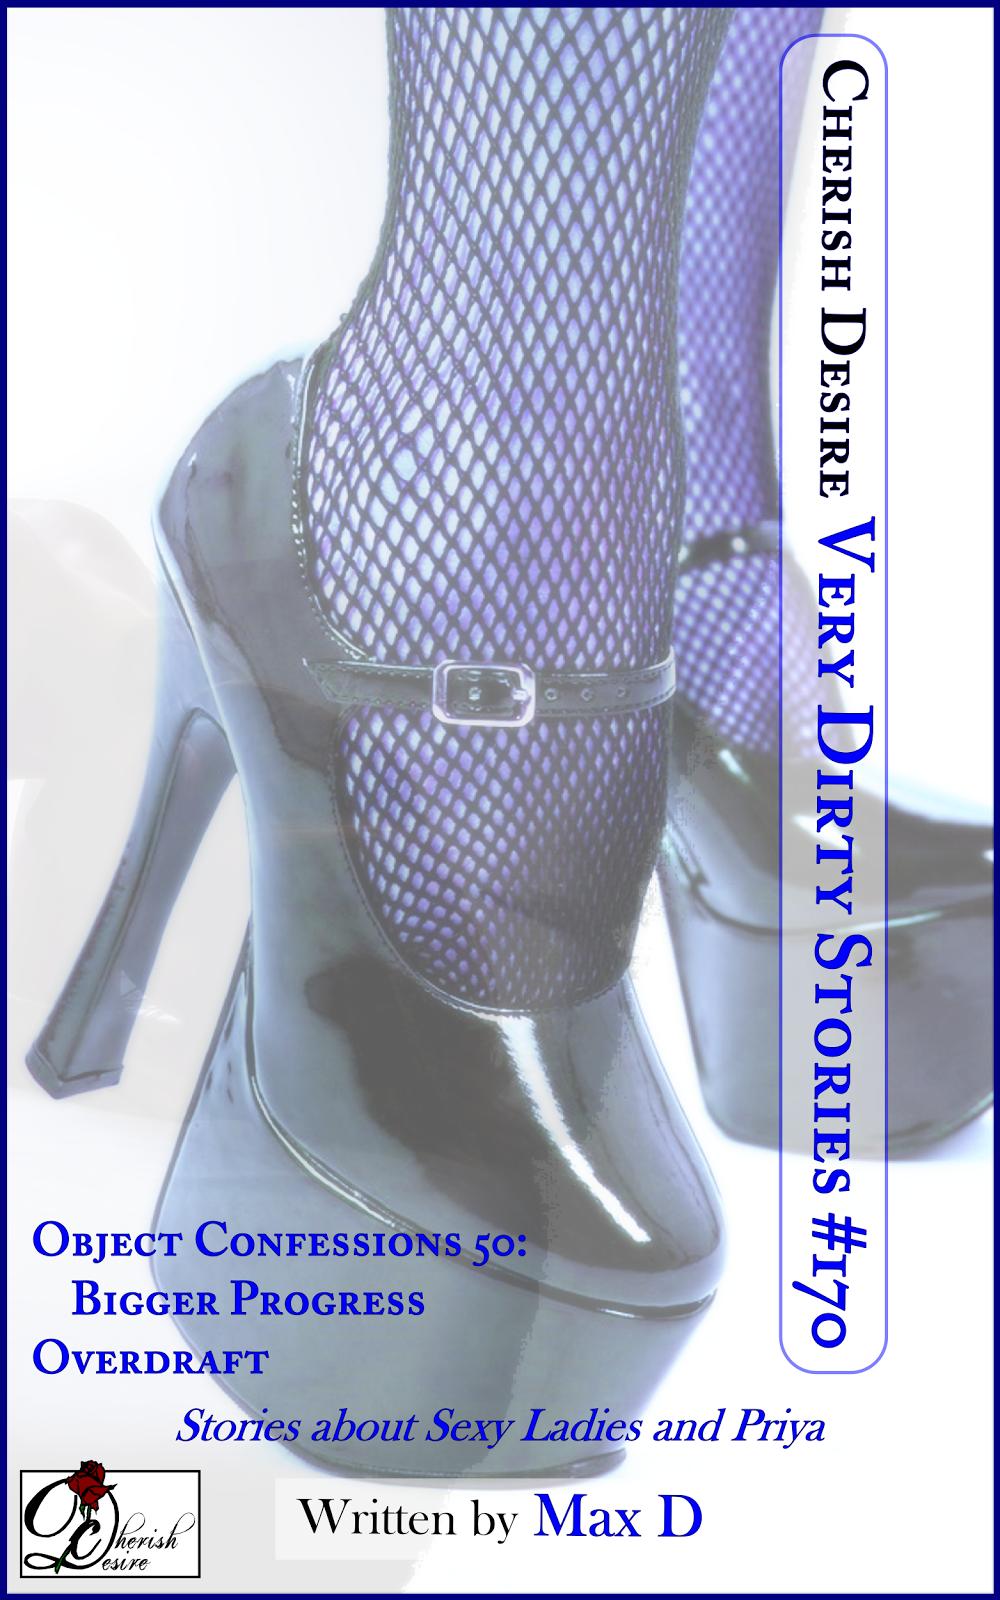 Cherish Desire: Very Dirty Stories #170, Max D, erotica